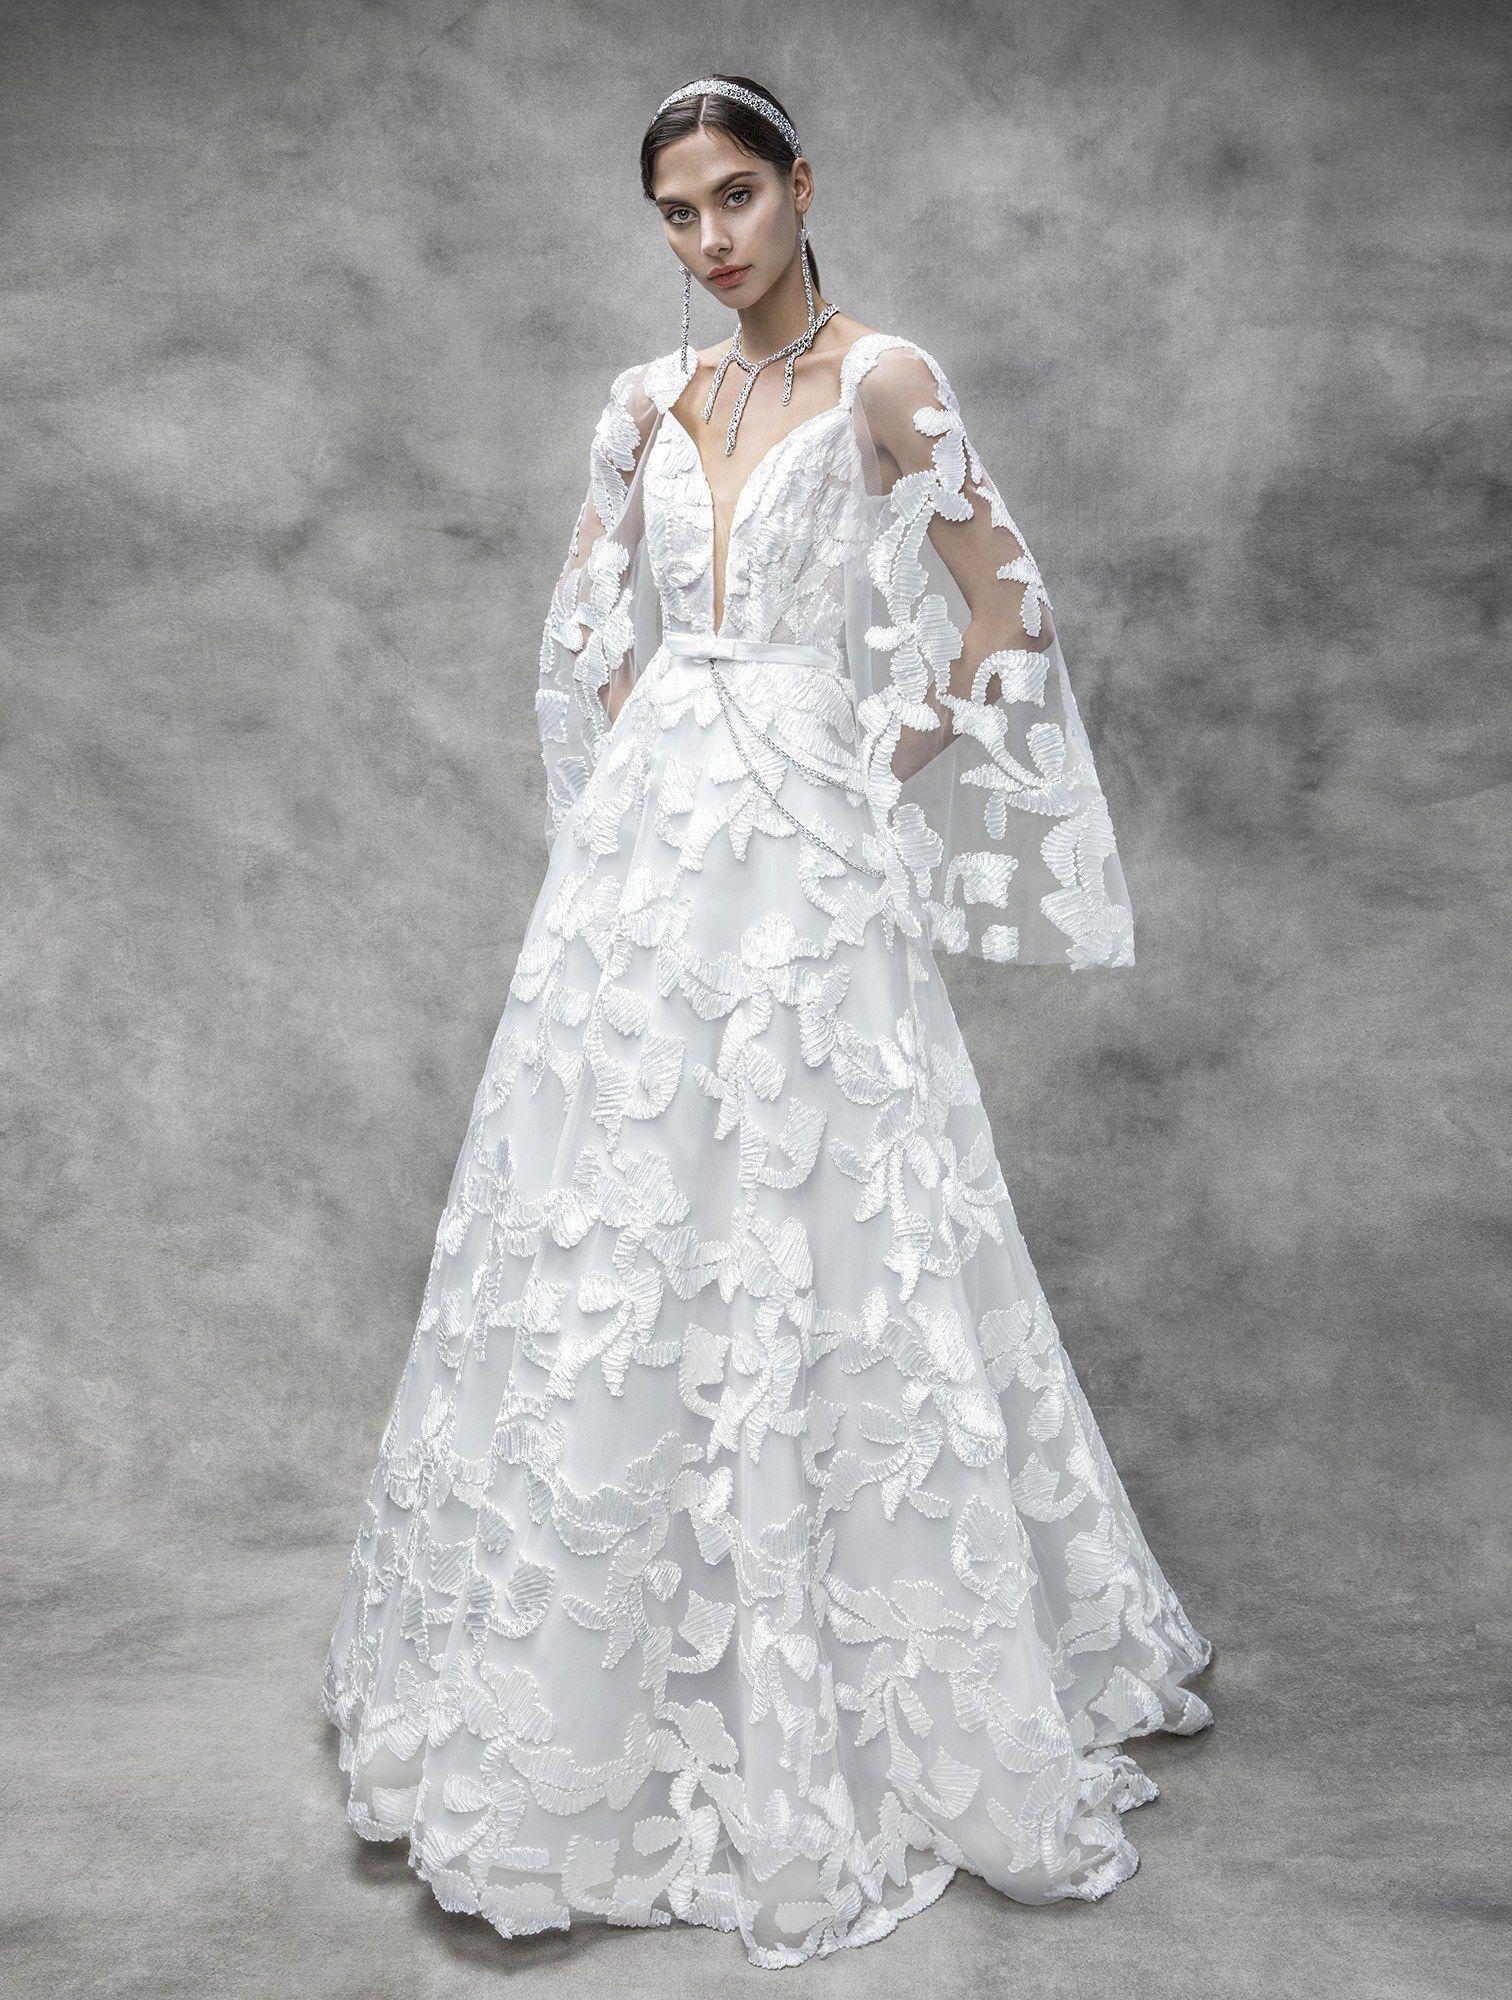 55624dea329da Victoria KyriaKides Bridal & Wedding Dress Collection Spring 2020 | Brides